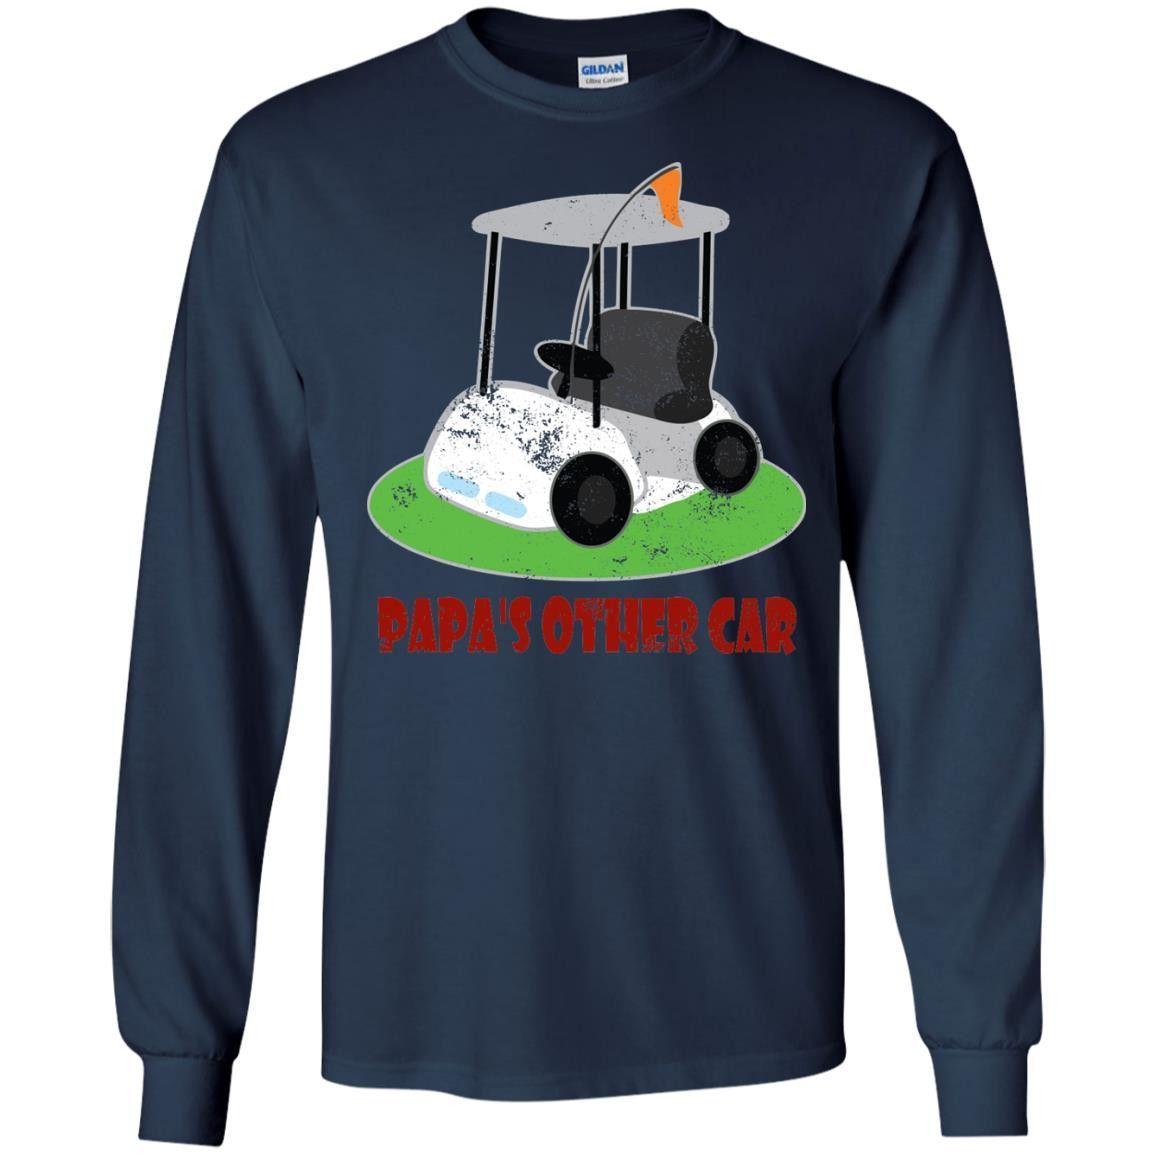 Men's Papa Grandpa Dad T-shirt Golfing Fathers Day Golf Cart Tee LS Ultra Cotton Tshirt